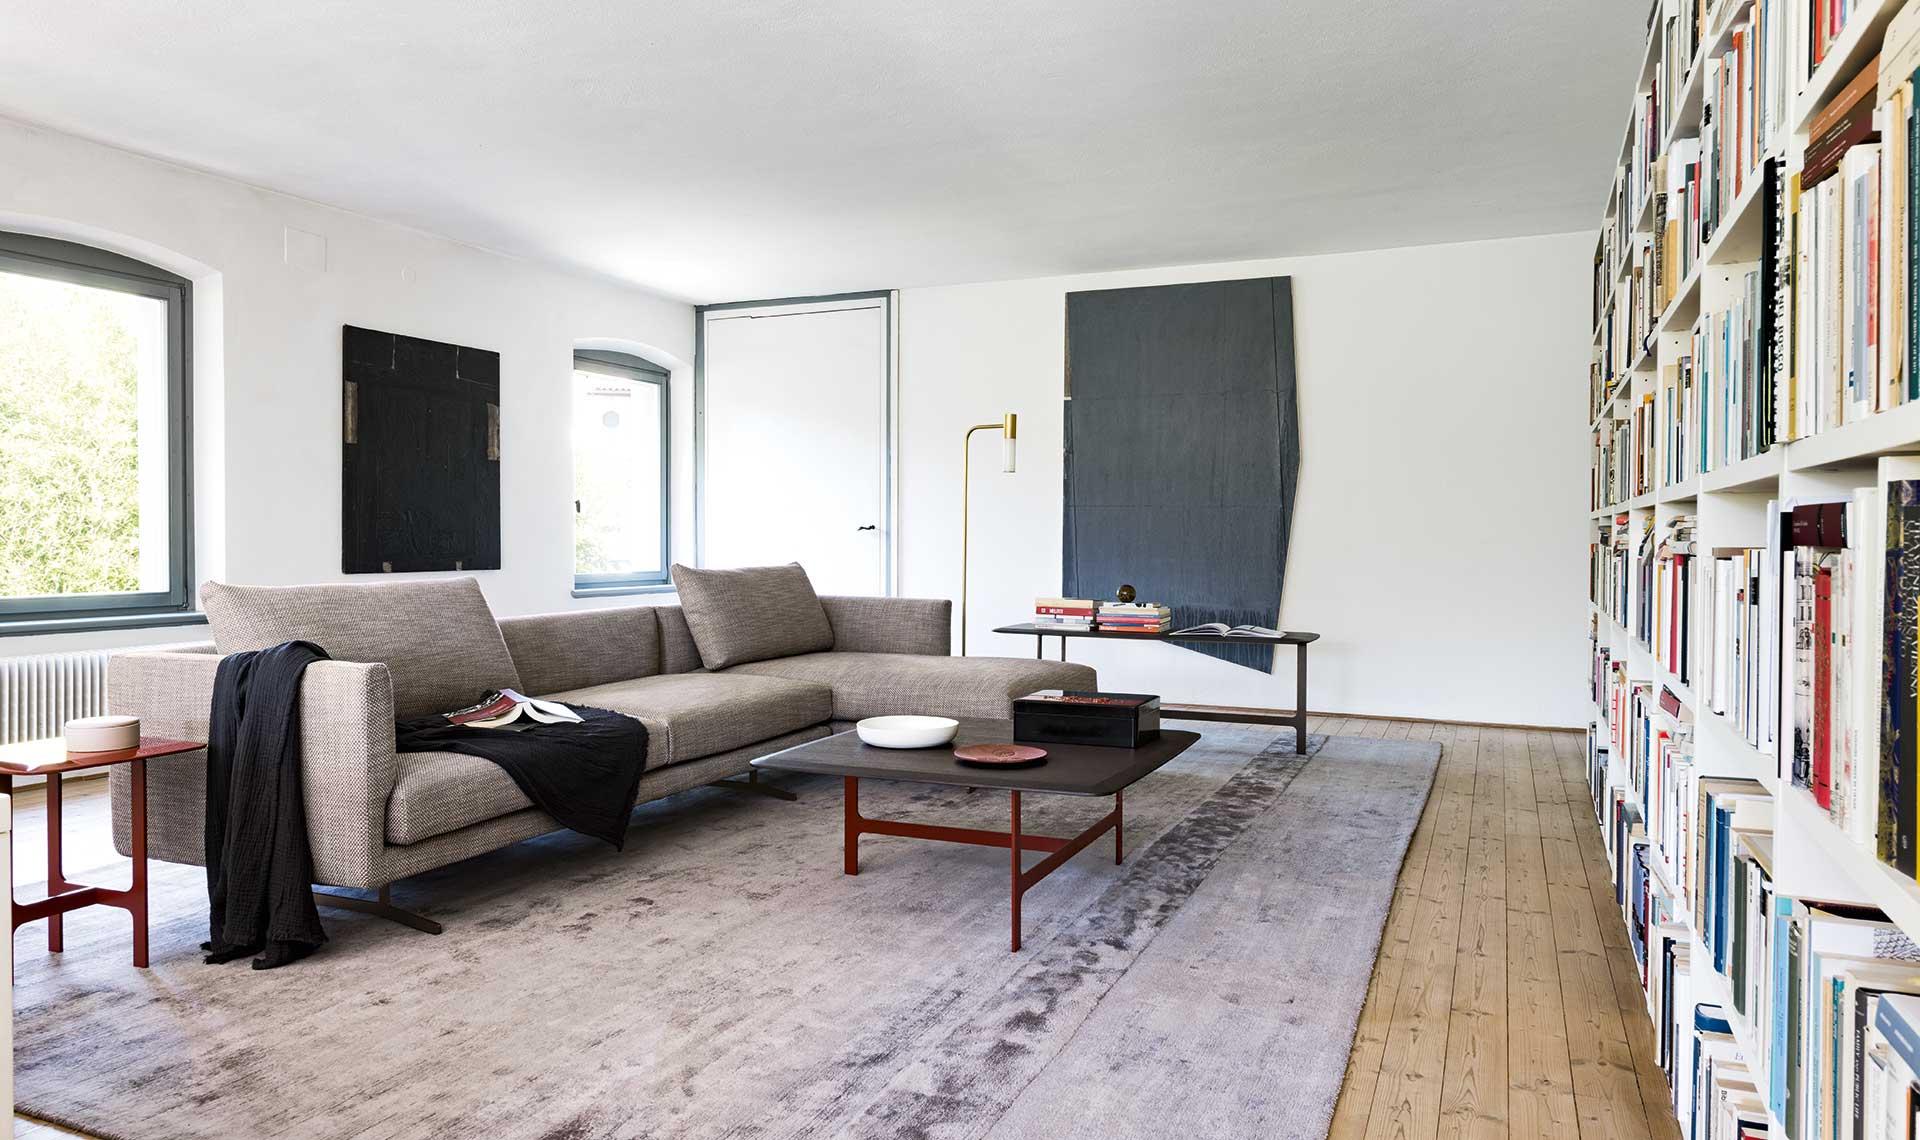 Divani: Copenaghen - design moderno Alf DaFré